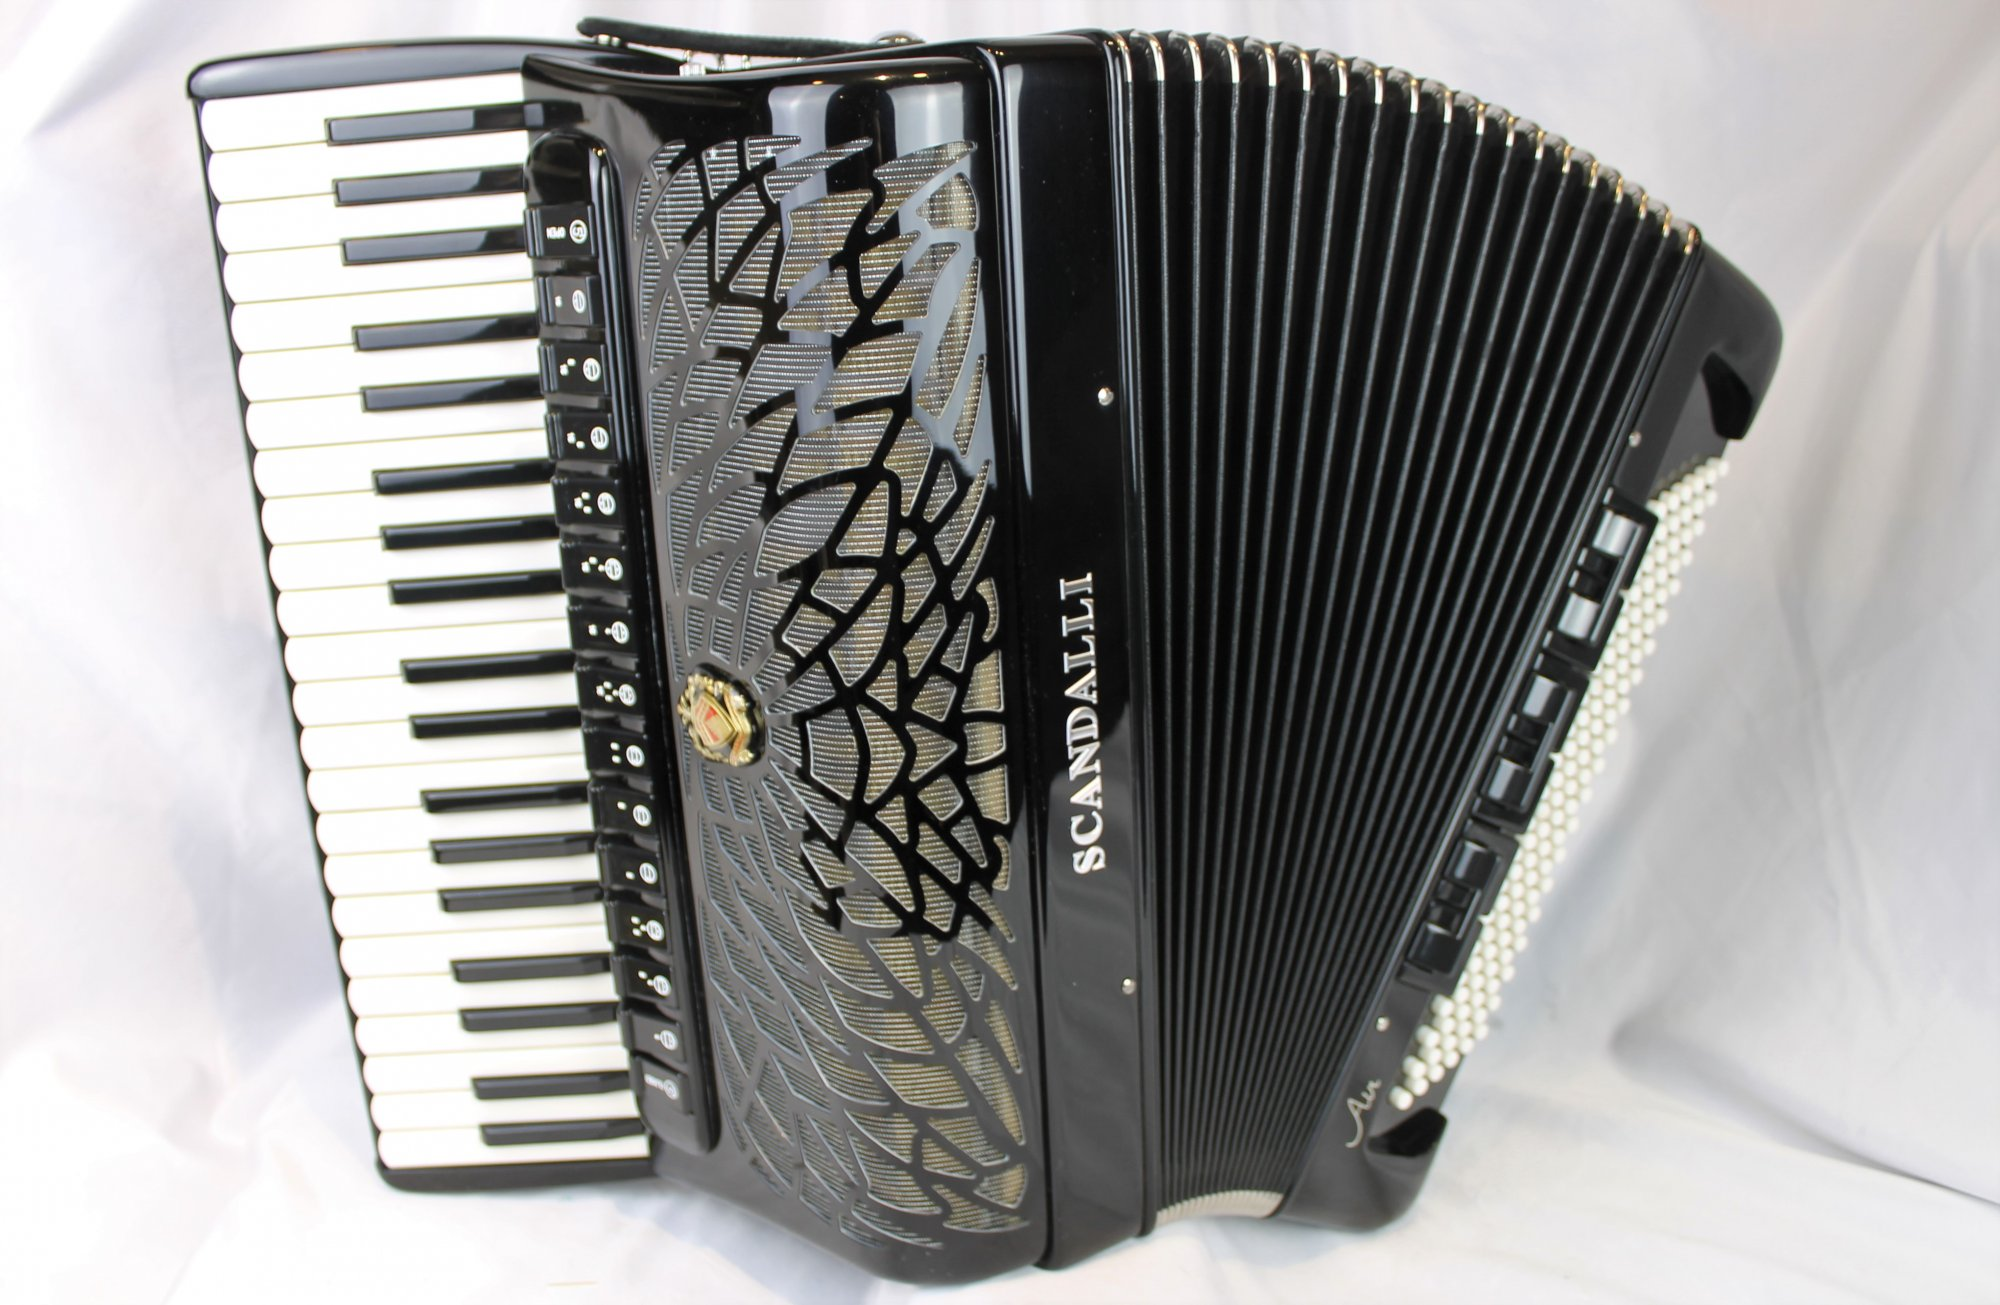 NEW Black Scandalli Air V Piano Accordion LMMMH 41 120